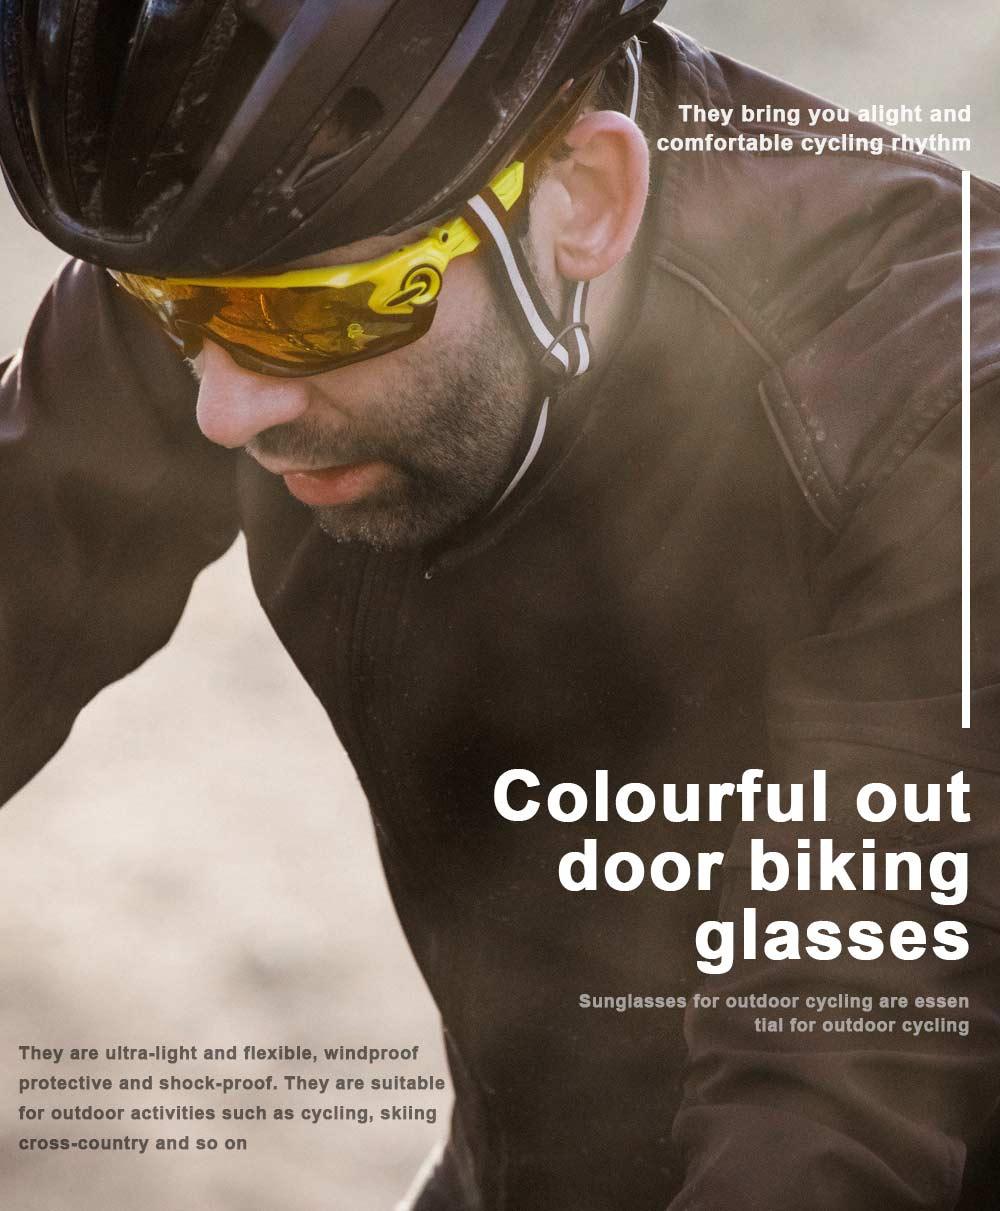 Colourful Outdoor Biking Glasses Sports Outdoor POC Riding Glasses Sandproof Sunglasses 0